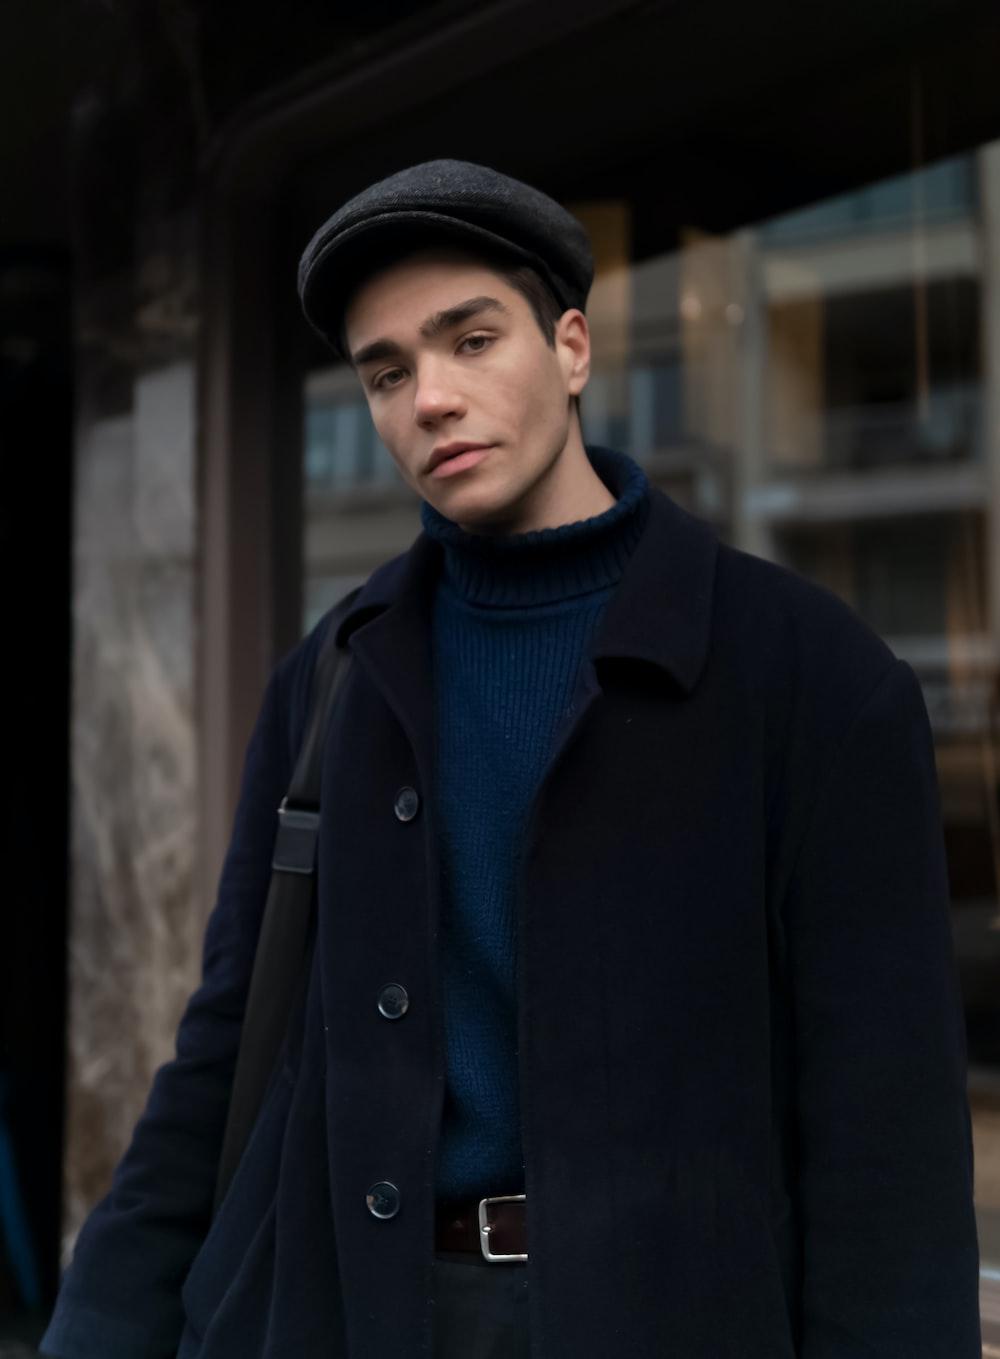 man in black coat and black hat